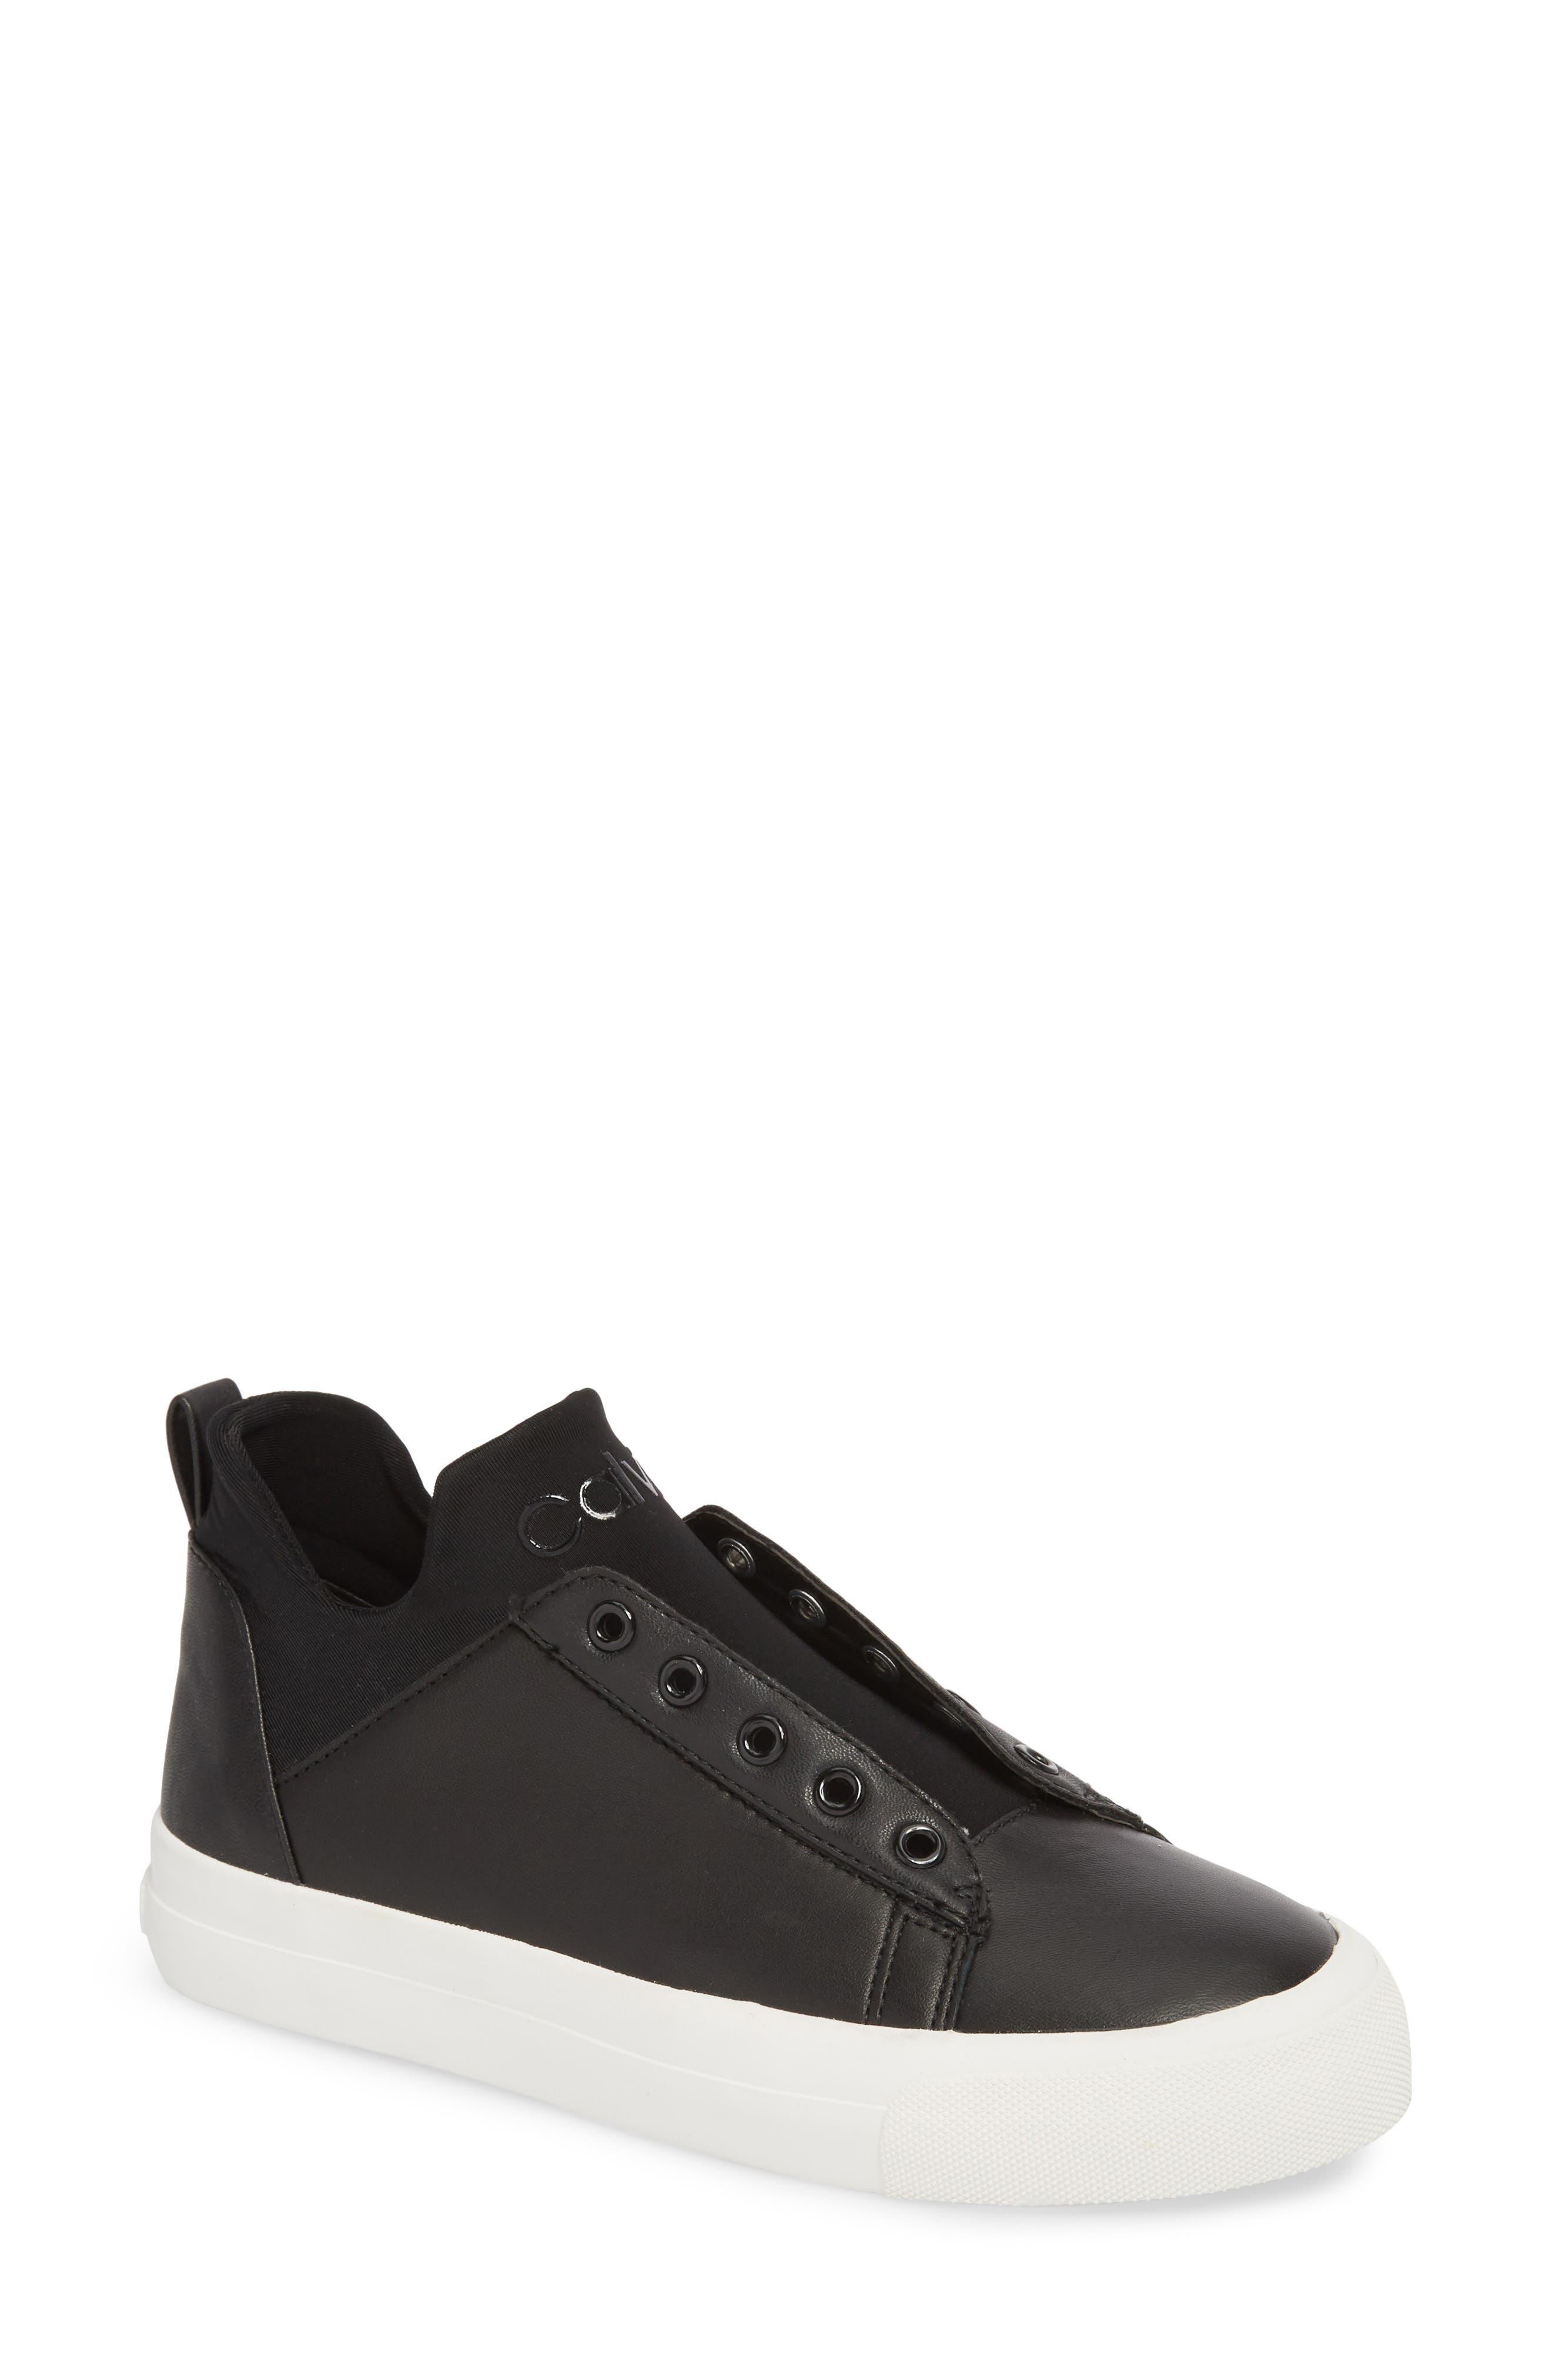 CALVIN KLEIN,                             Valorie Mid Top Sneaker,                             Main thumbnail 1, color,                             002